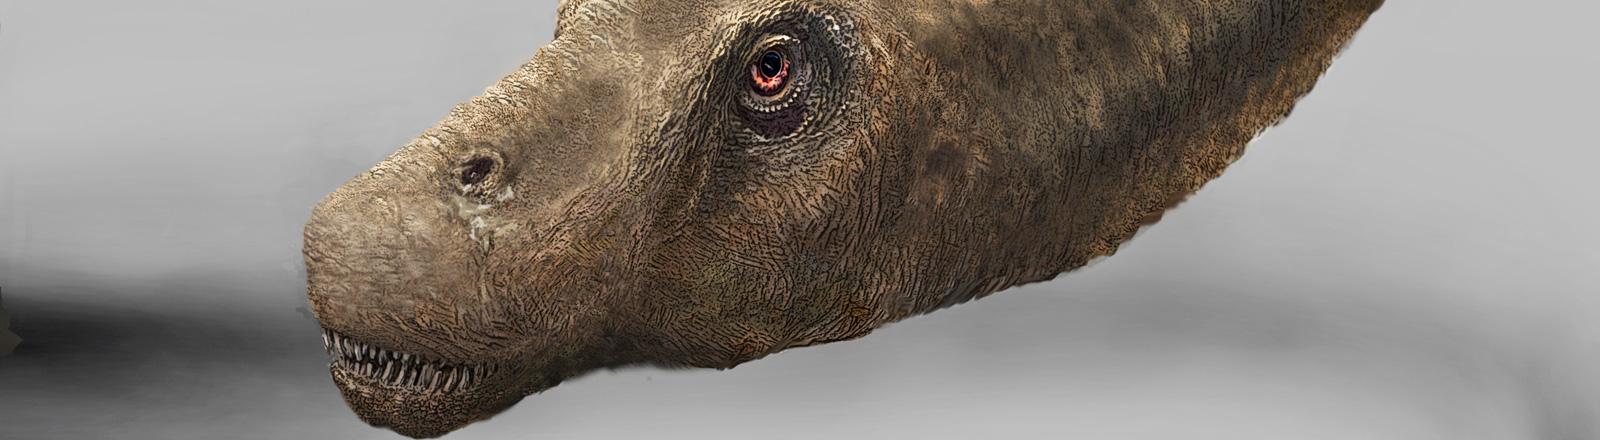 Illustration des Dreadnoughtus schrani; Bild: Mark A. Klingler / Carnegie Museum of Natural History / dpa